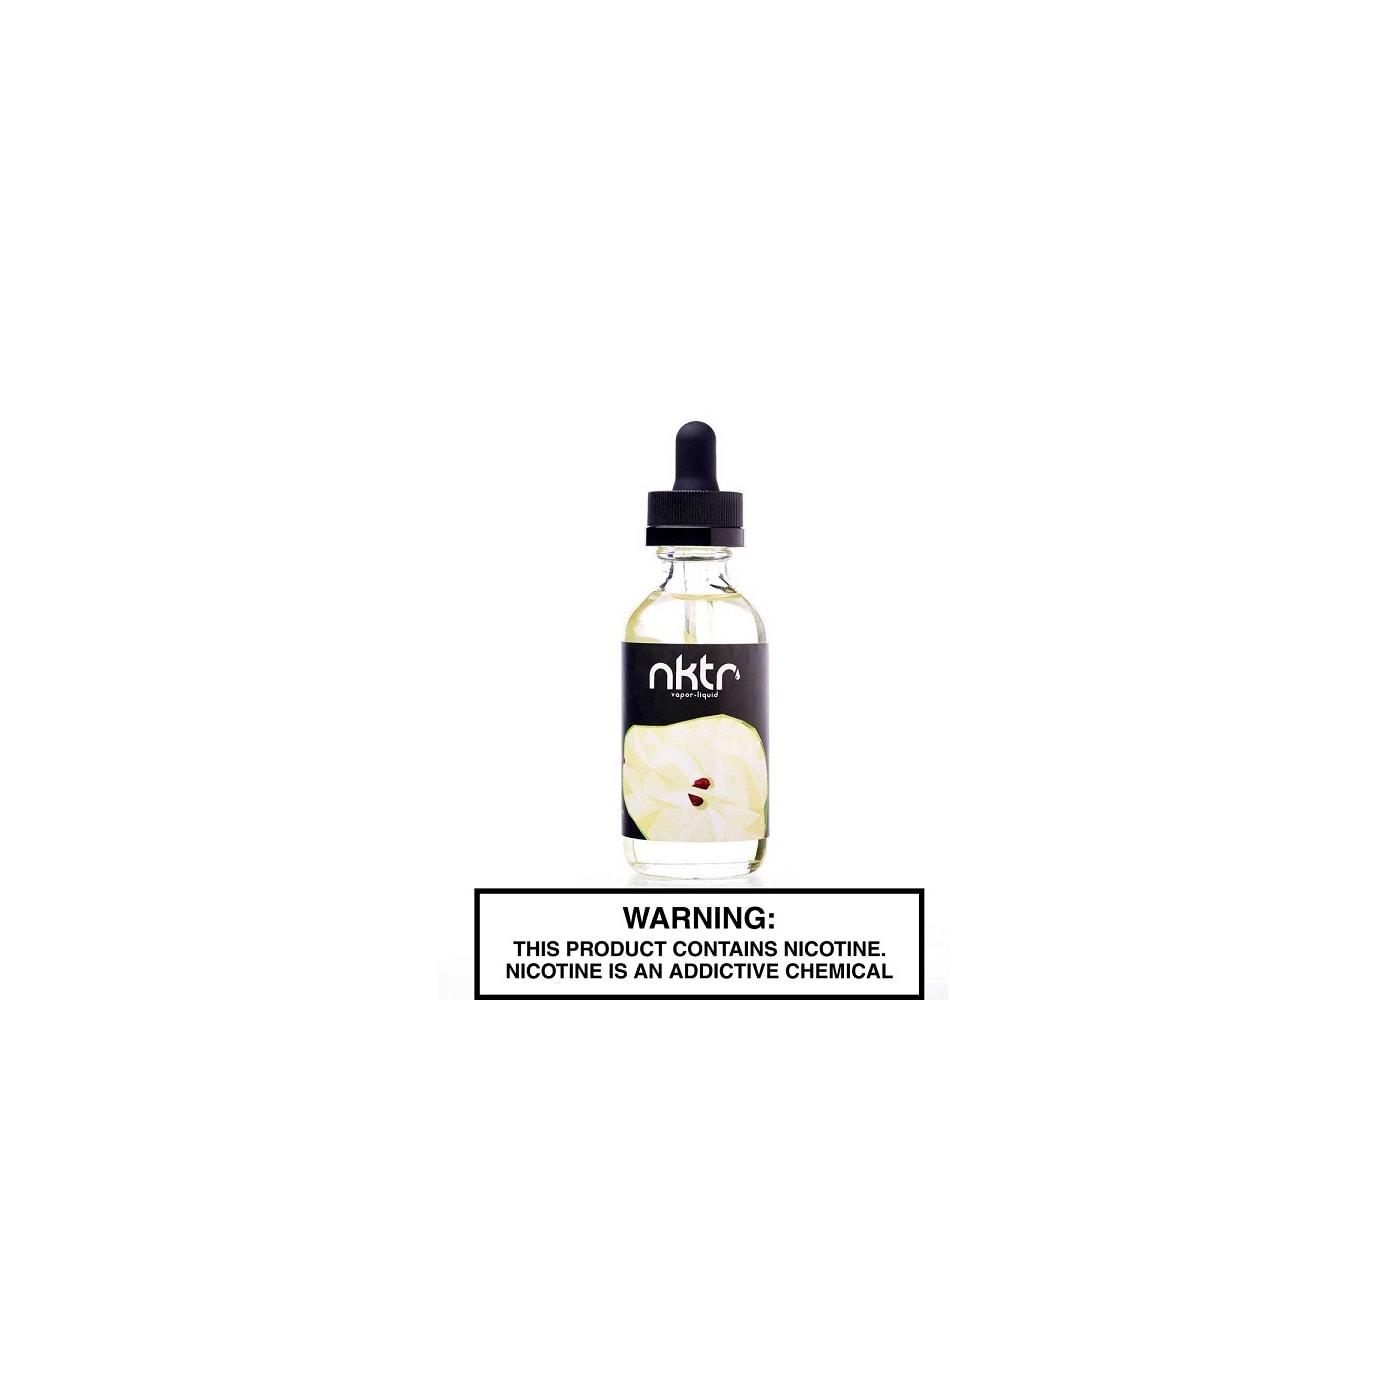 NKTR Pear